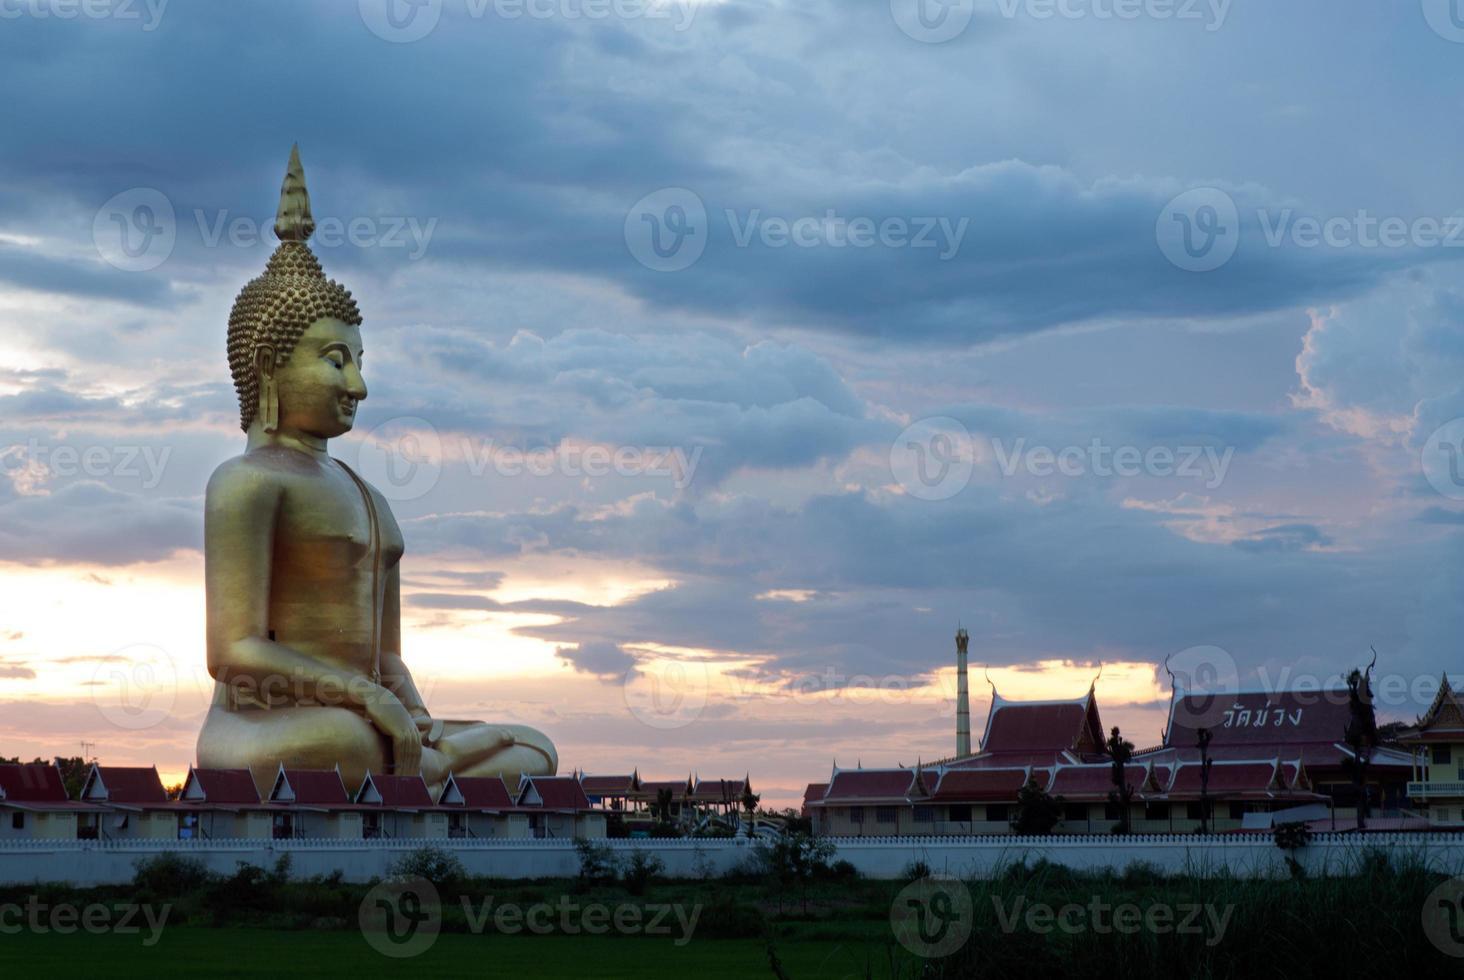 buiten van beroemde grote zittende Boeddha in Thaise tempel. foto